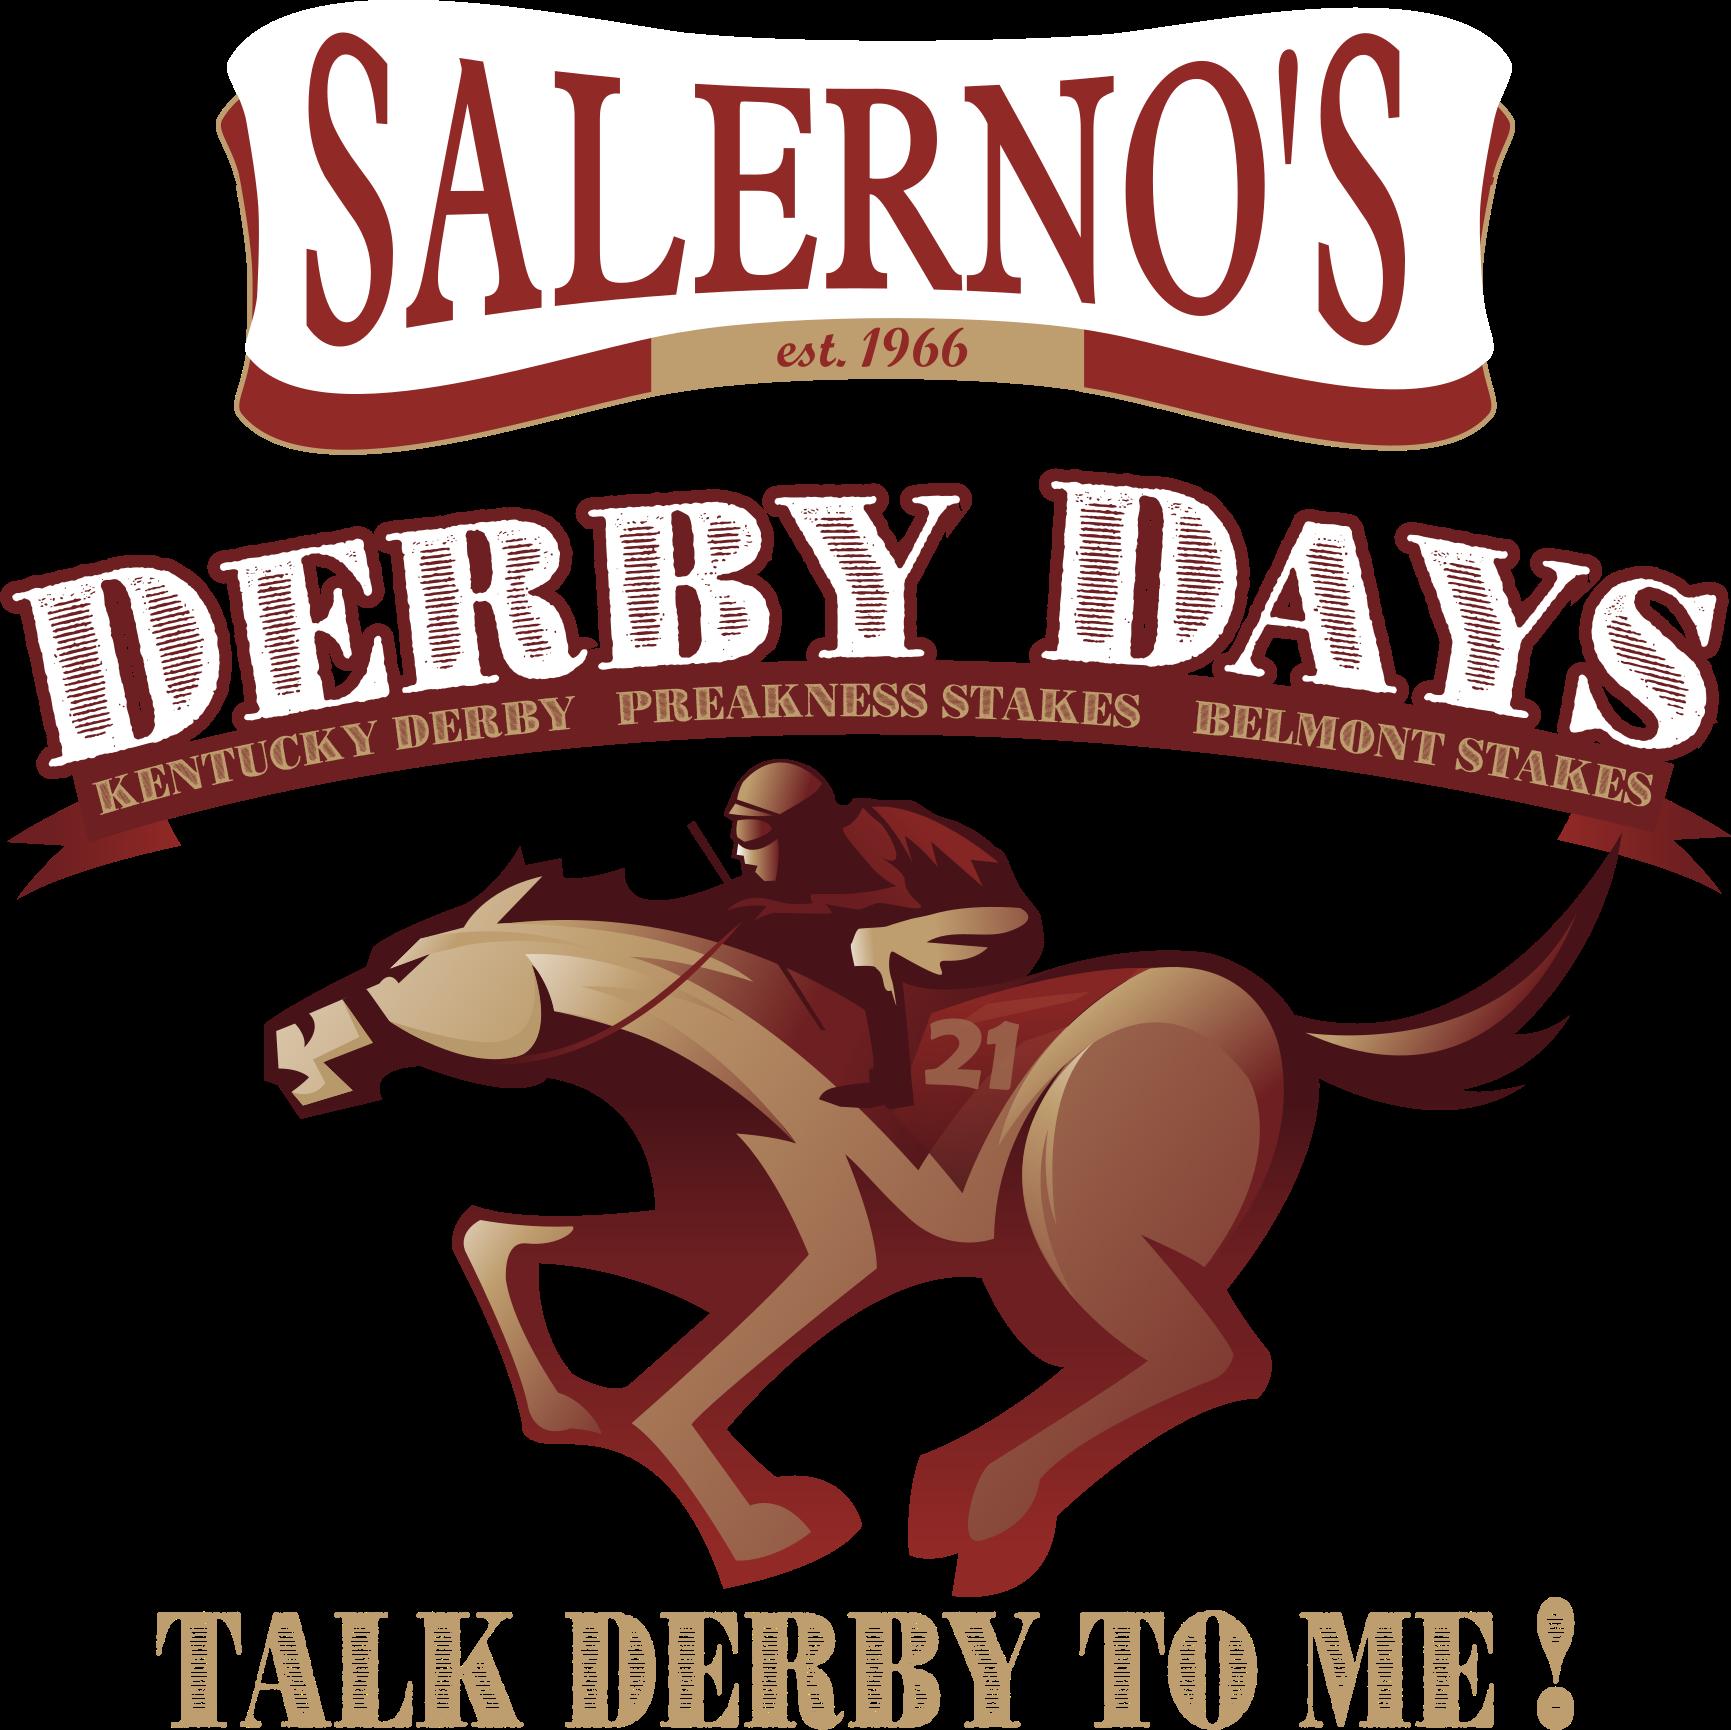 salerno's pizzeria and r bar logo